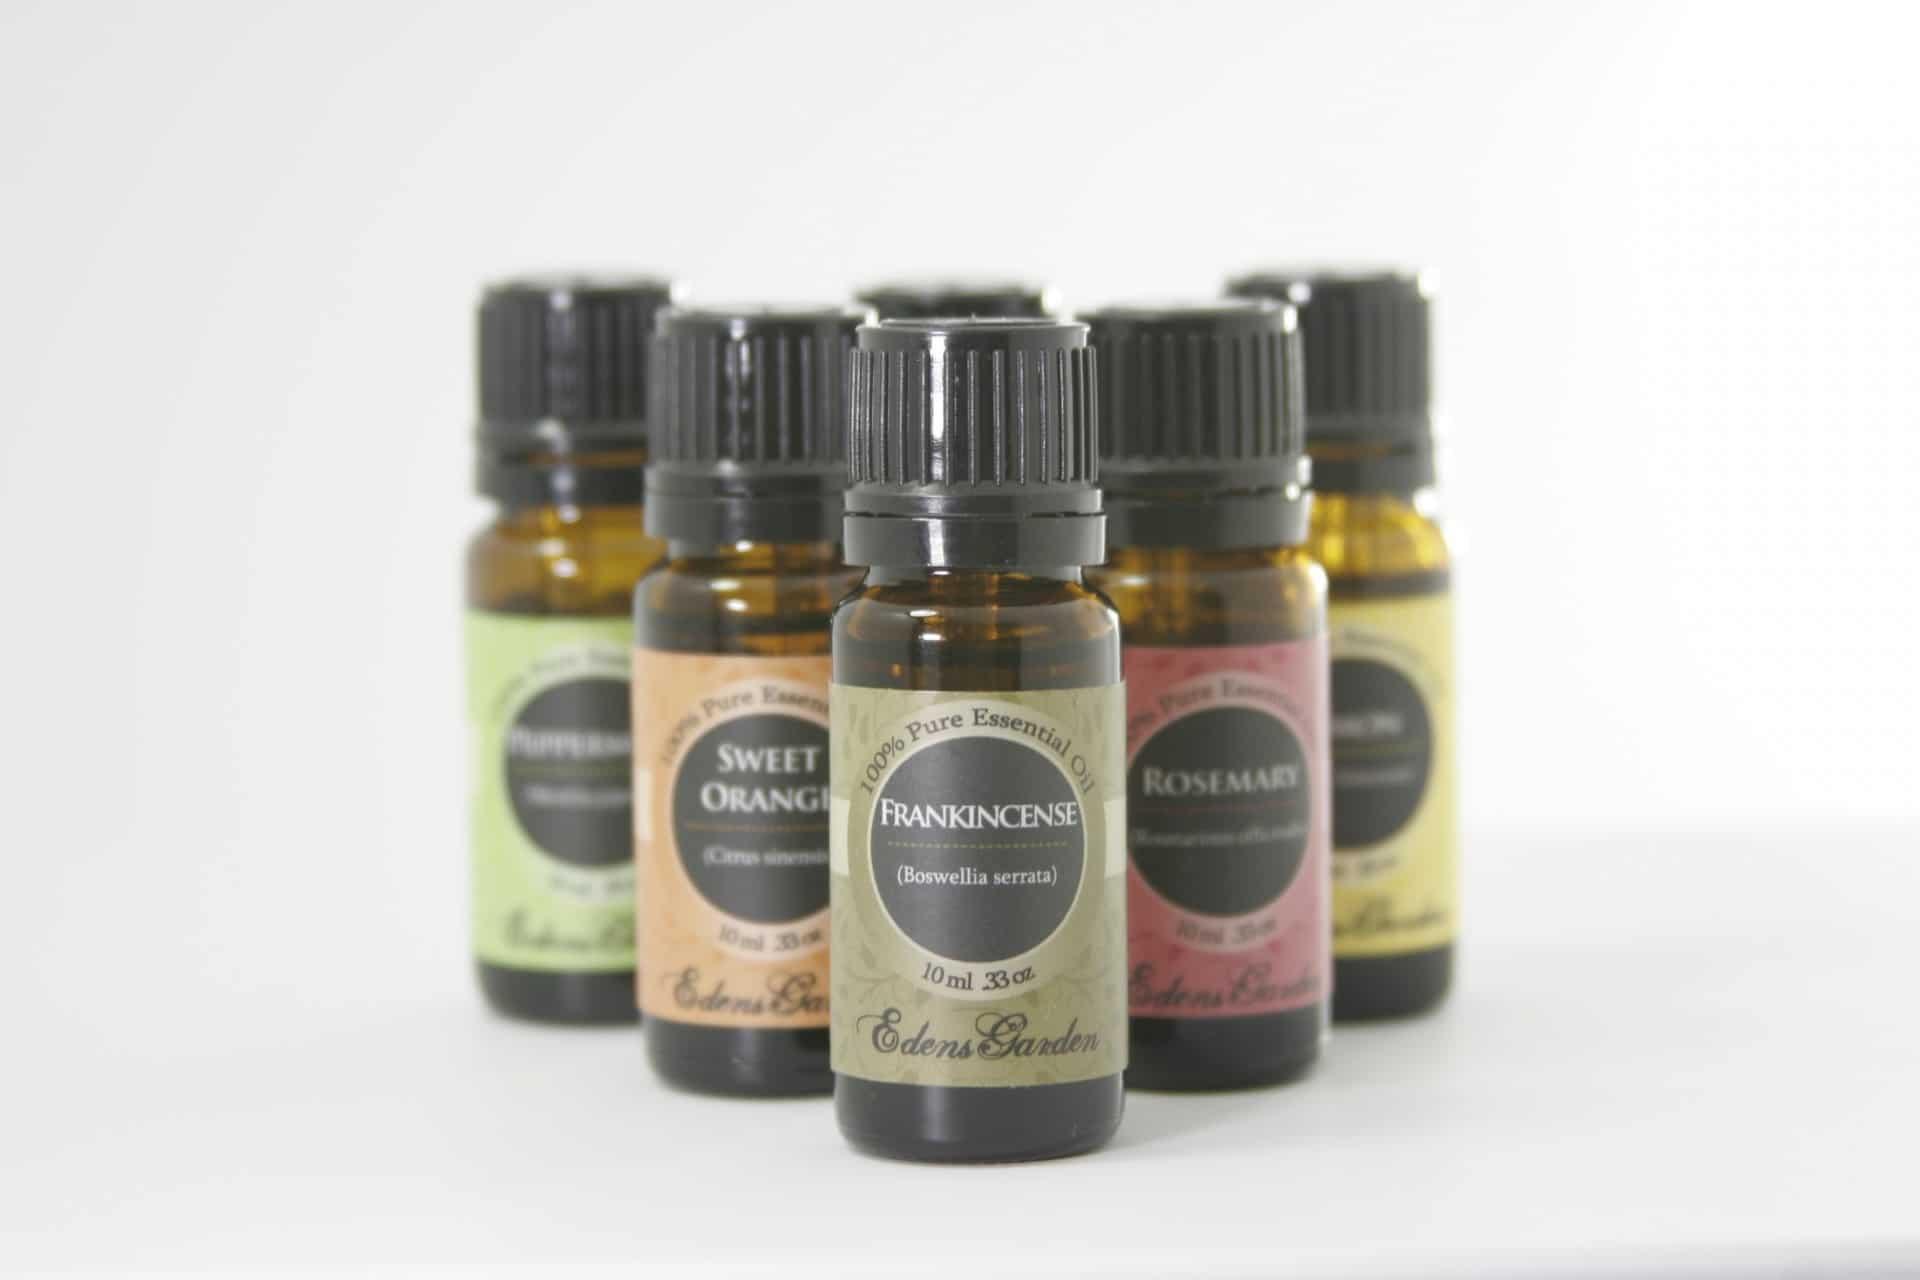 Edens Garden Essential Oils Review 2020 Worth The Money